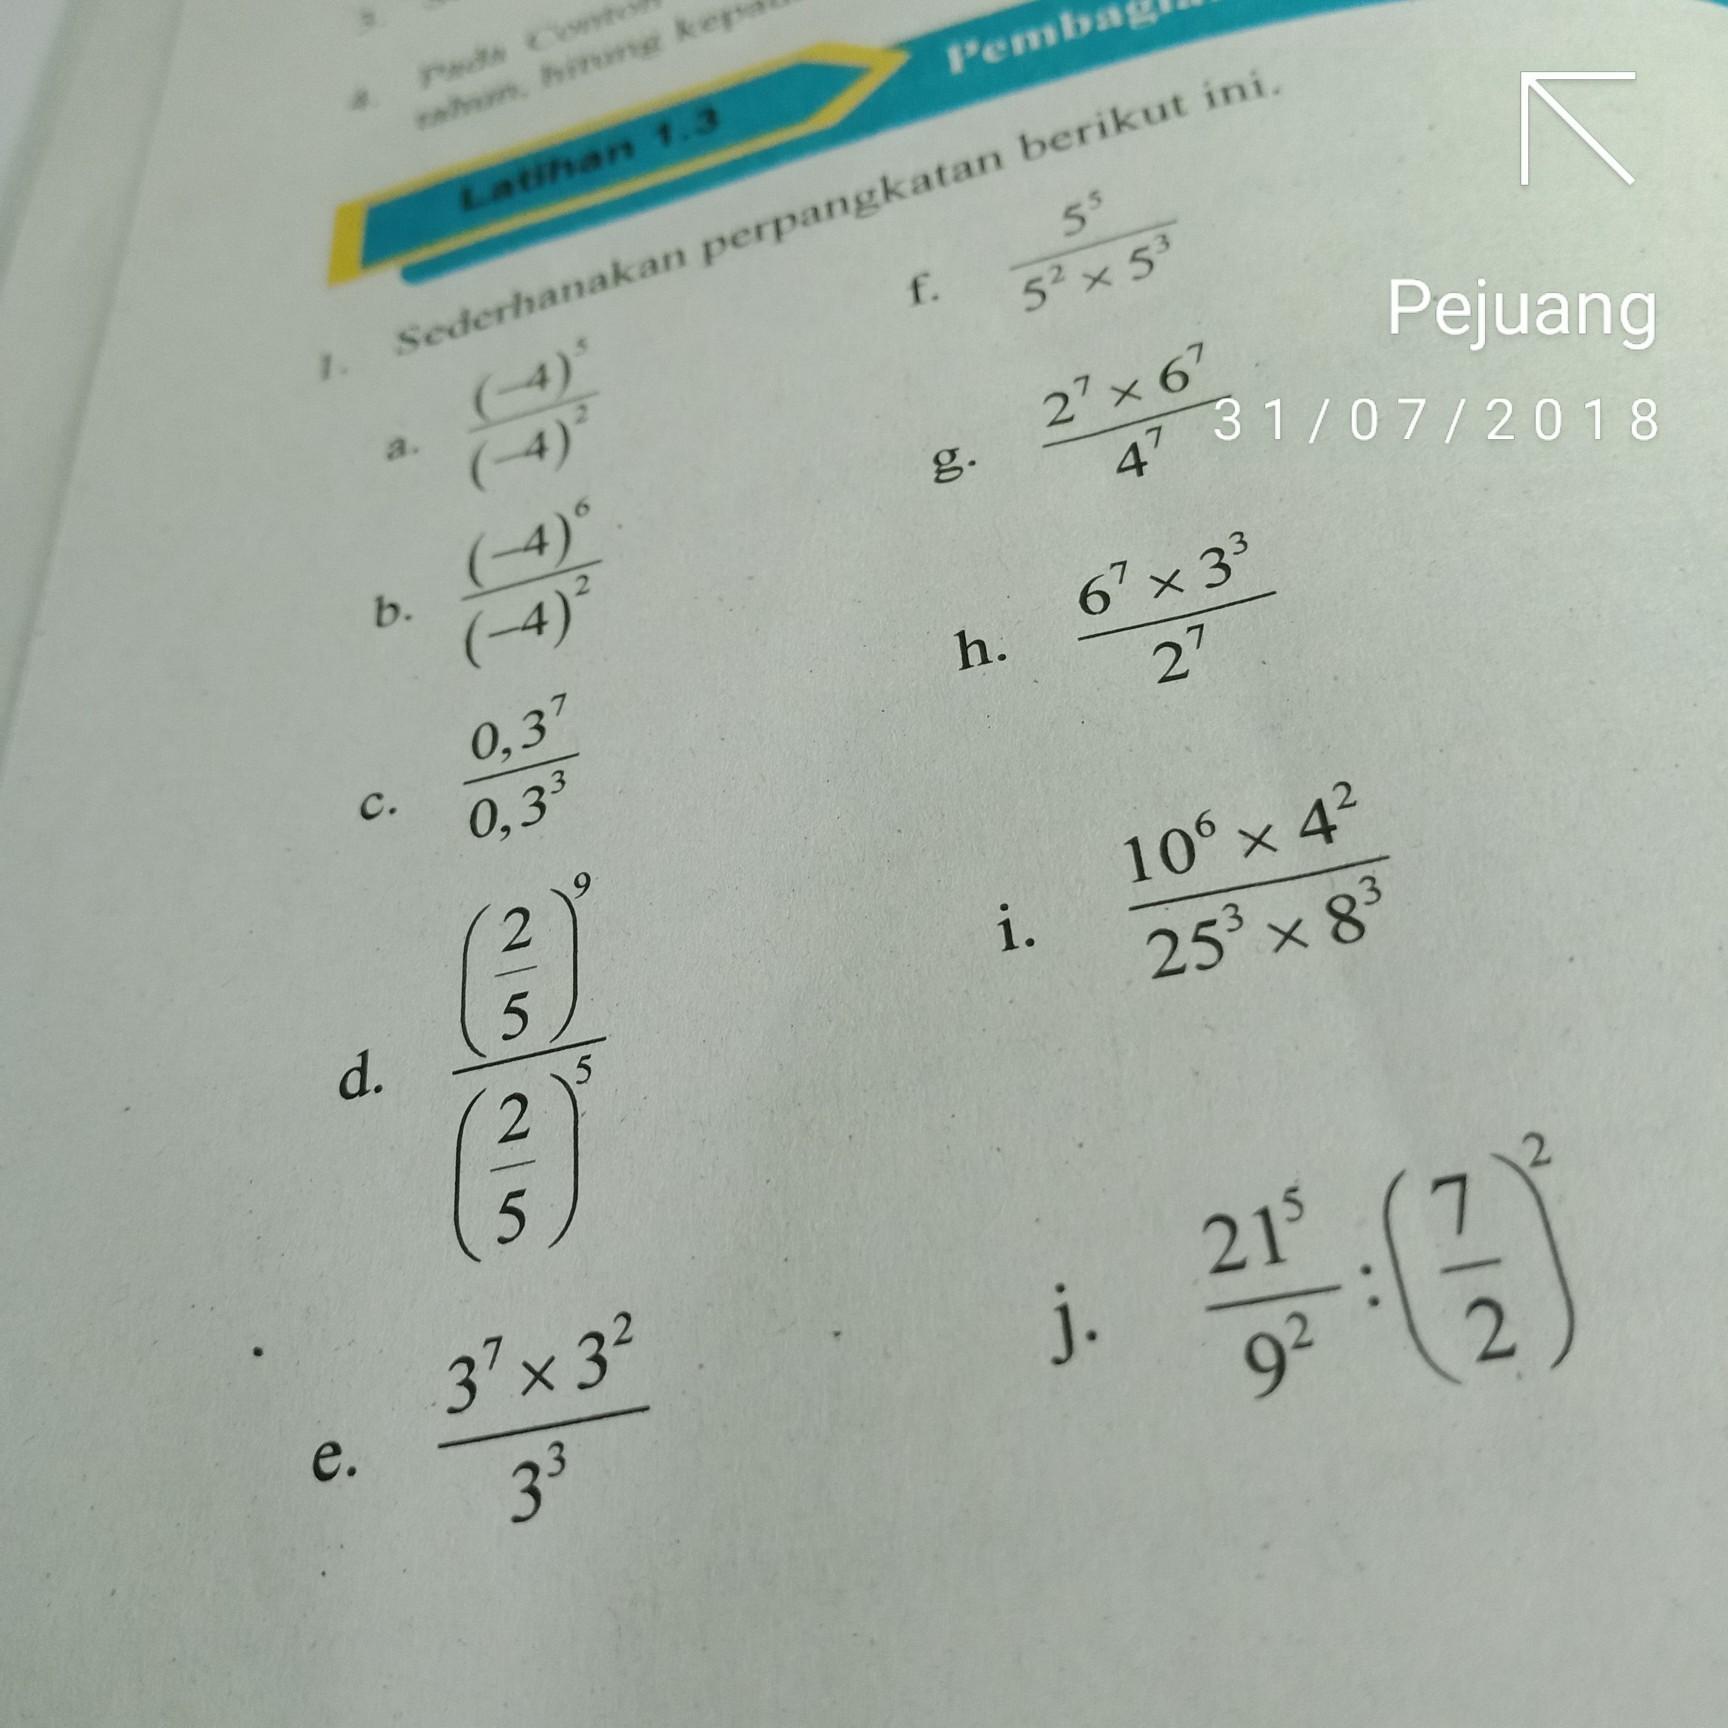 Lsbt = luas setengah bola tertutup. Jawaban Paket Matematika Halaman 30 Kelas 9 Kurikulum 2013 Semester 1 Brainly Co Id